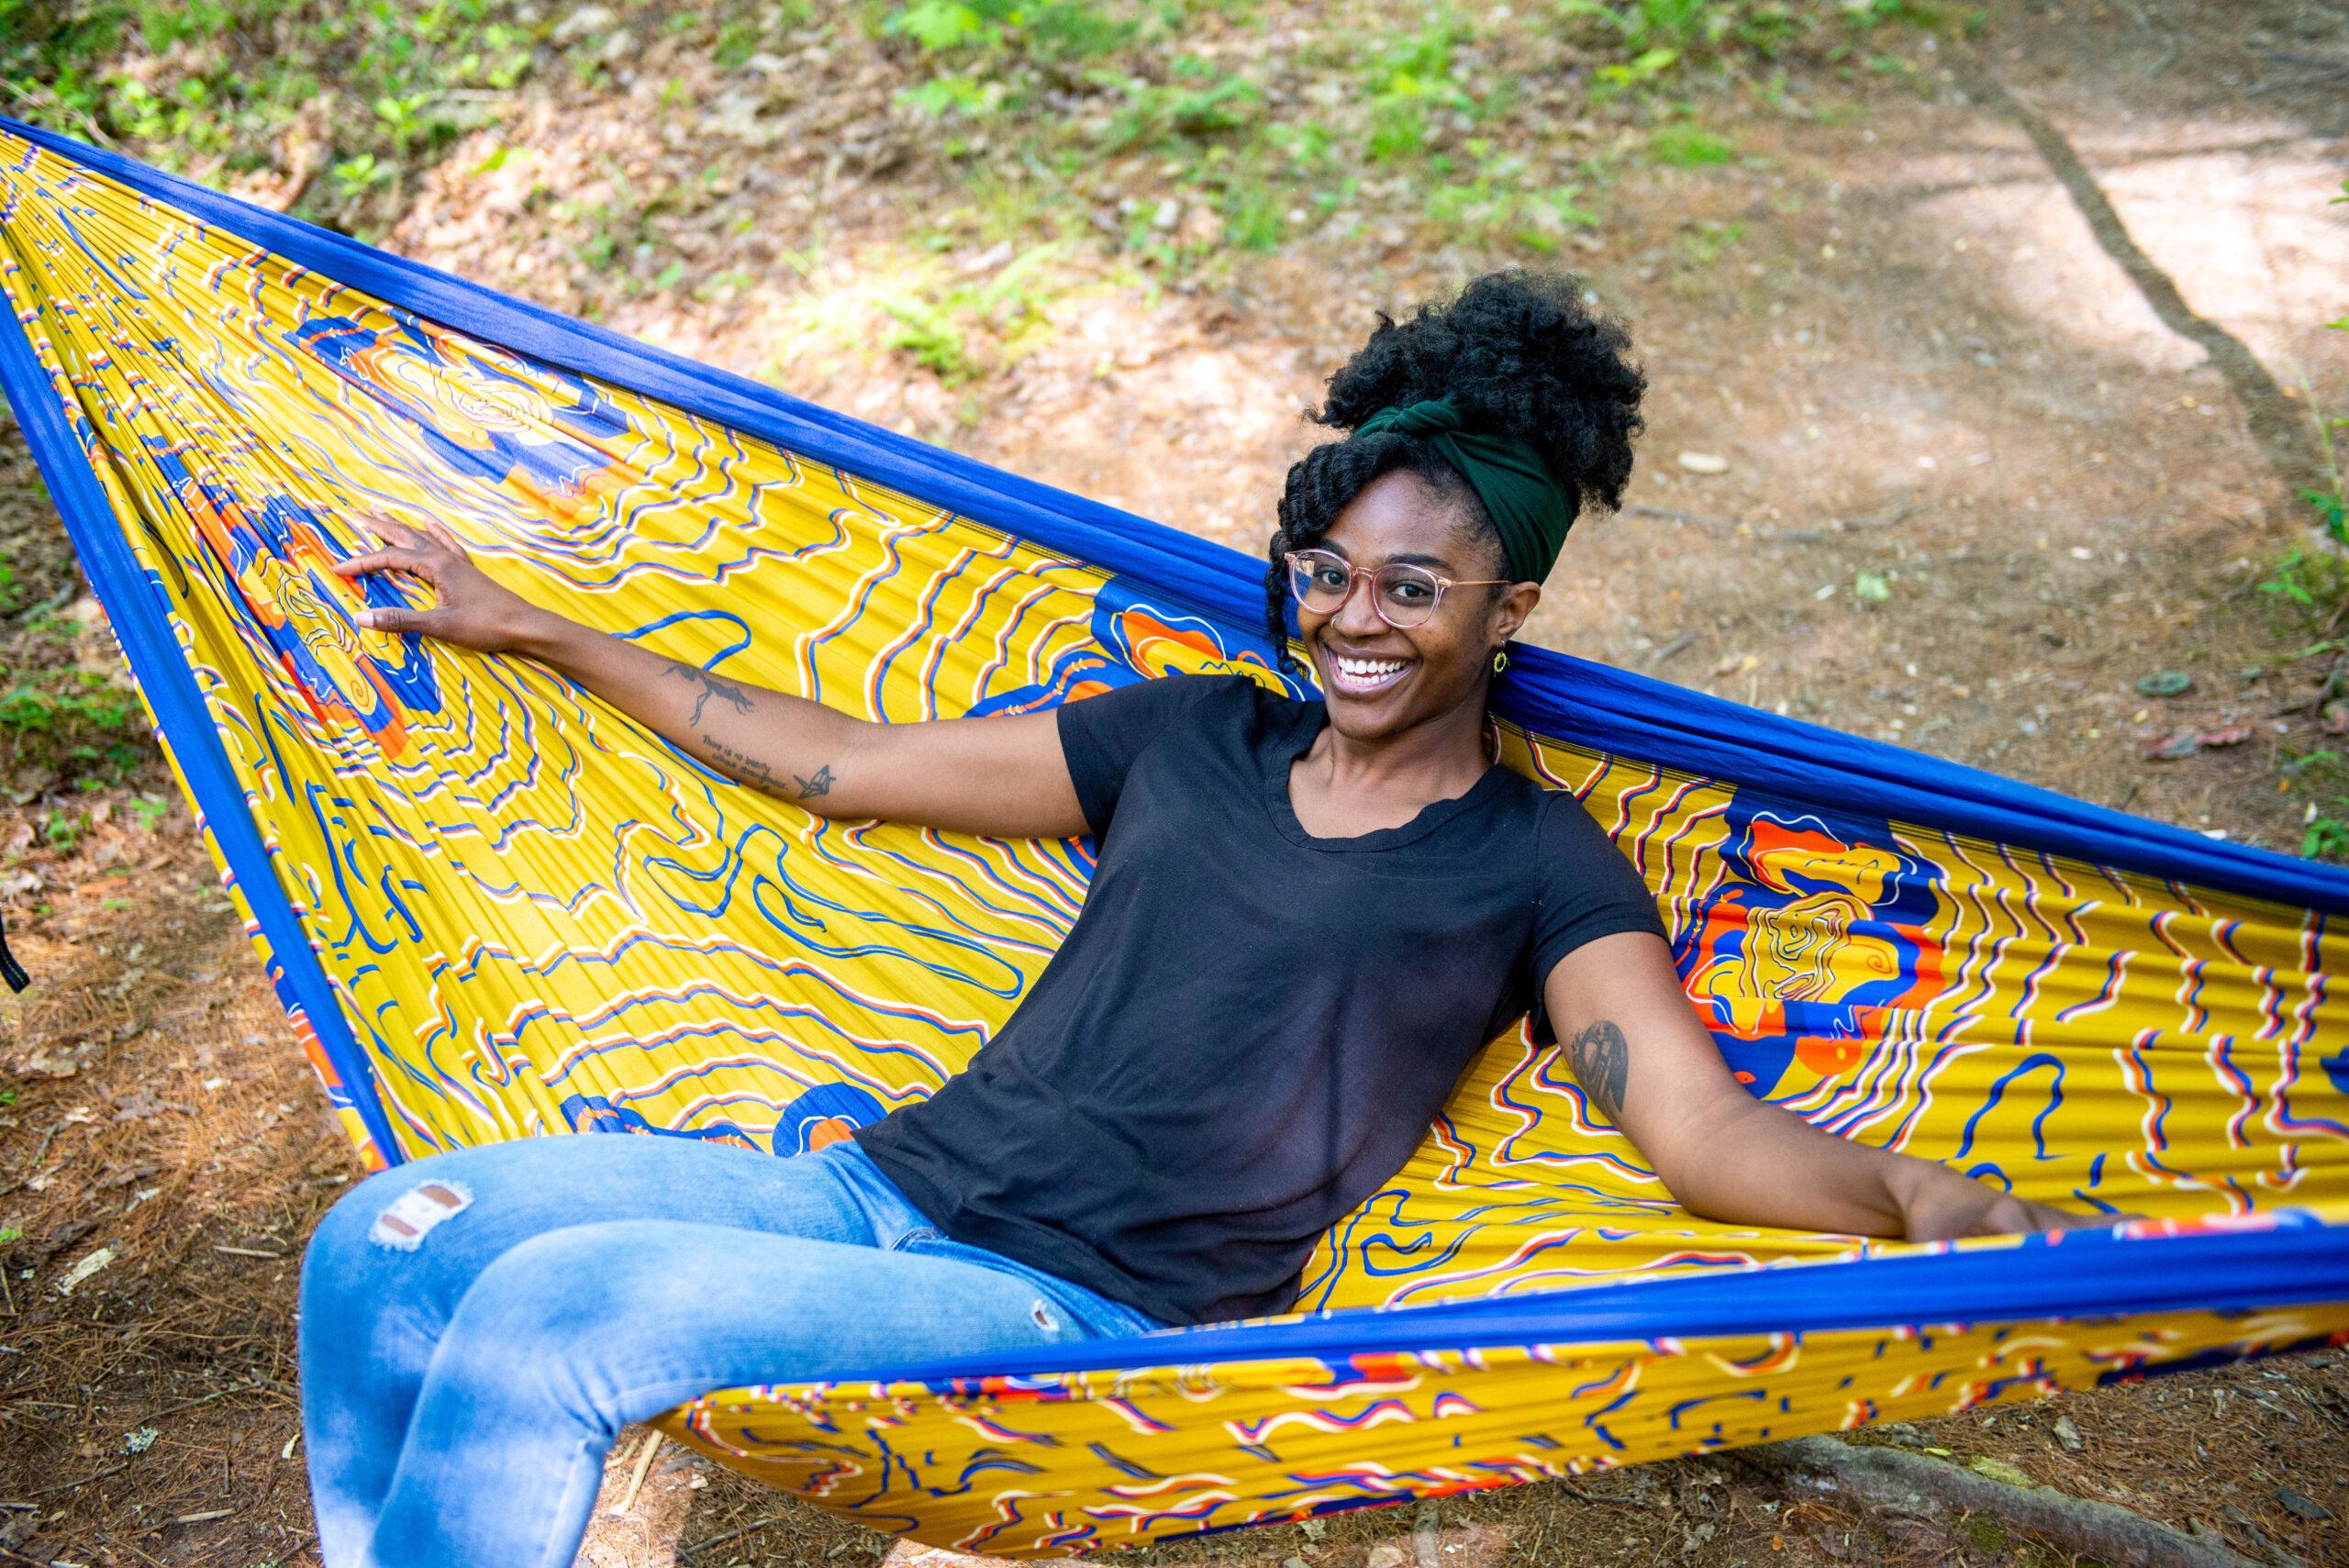 Leandra Taylor, the artist and Outdoor Afro volunteer leader lounging in the Kili Mapp Kili DoubleNest Hammock Print she designed.